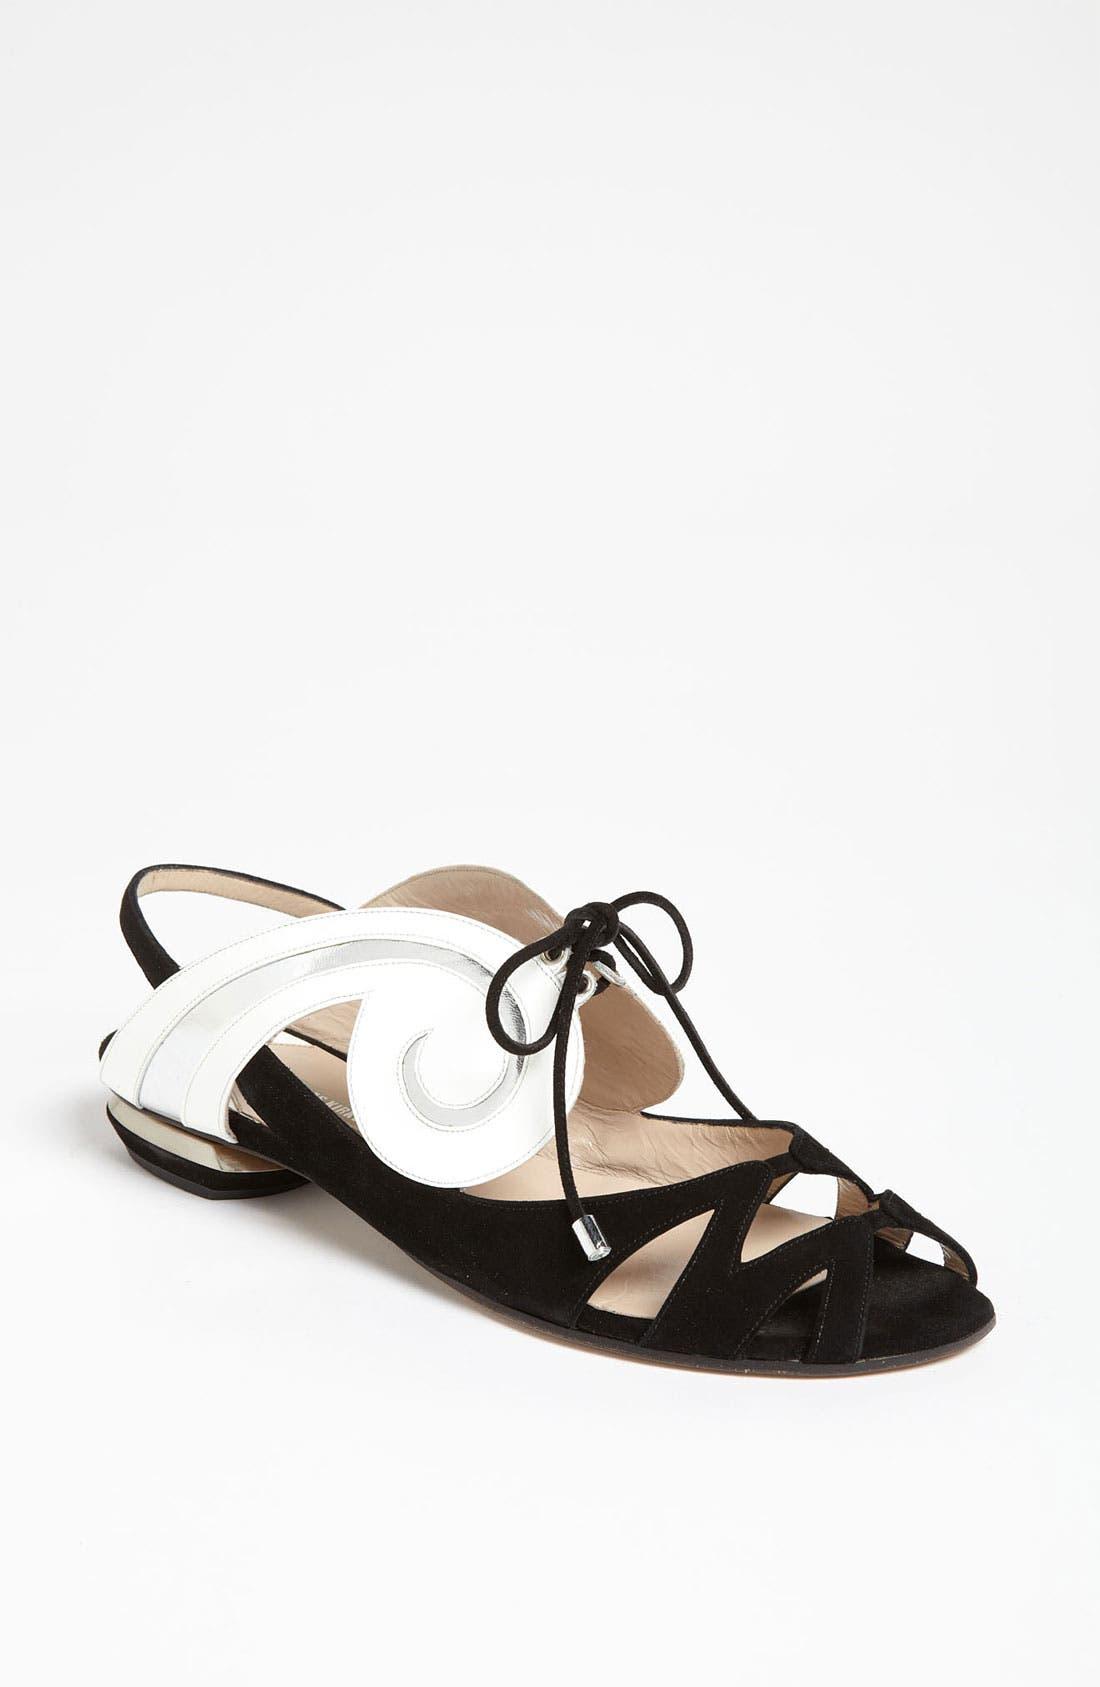 Main Image - Nicholas Kirkwood 'Swirl' Flat Sandal